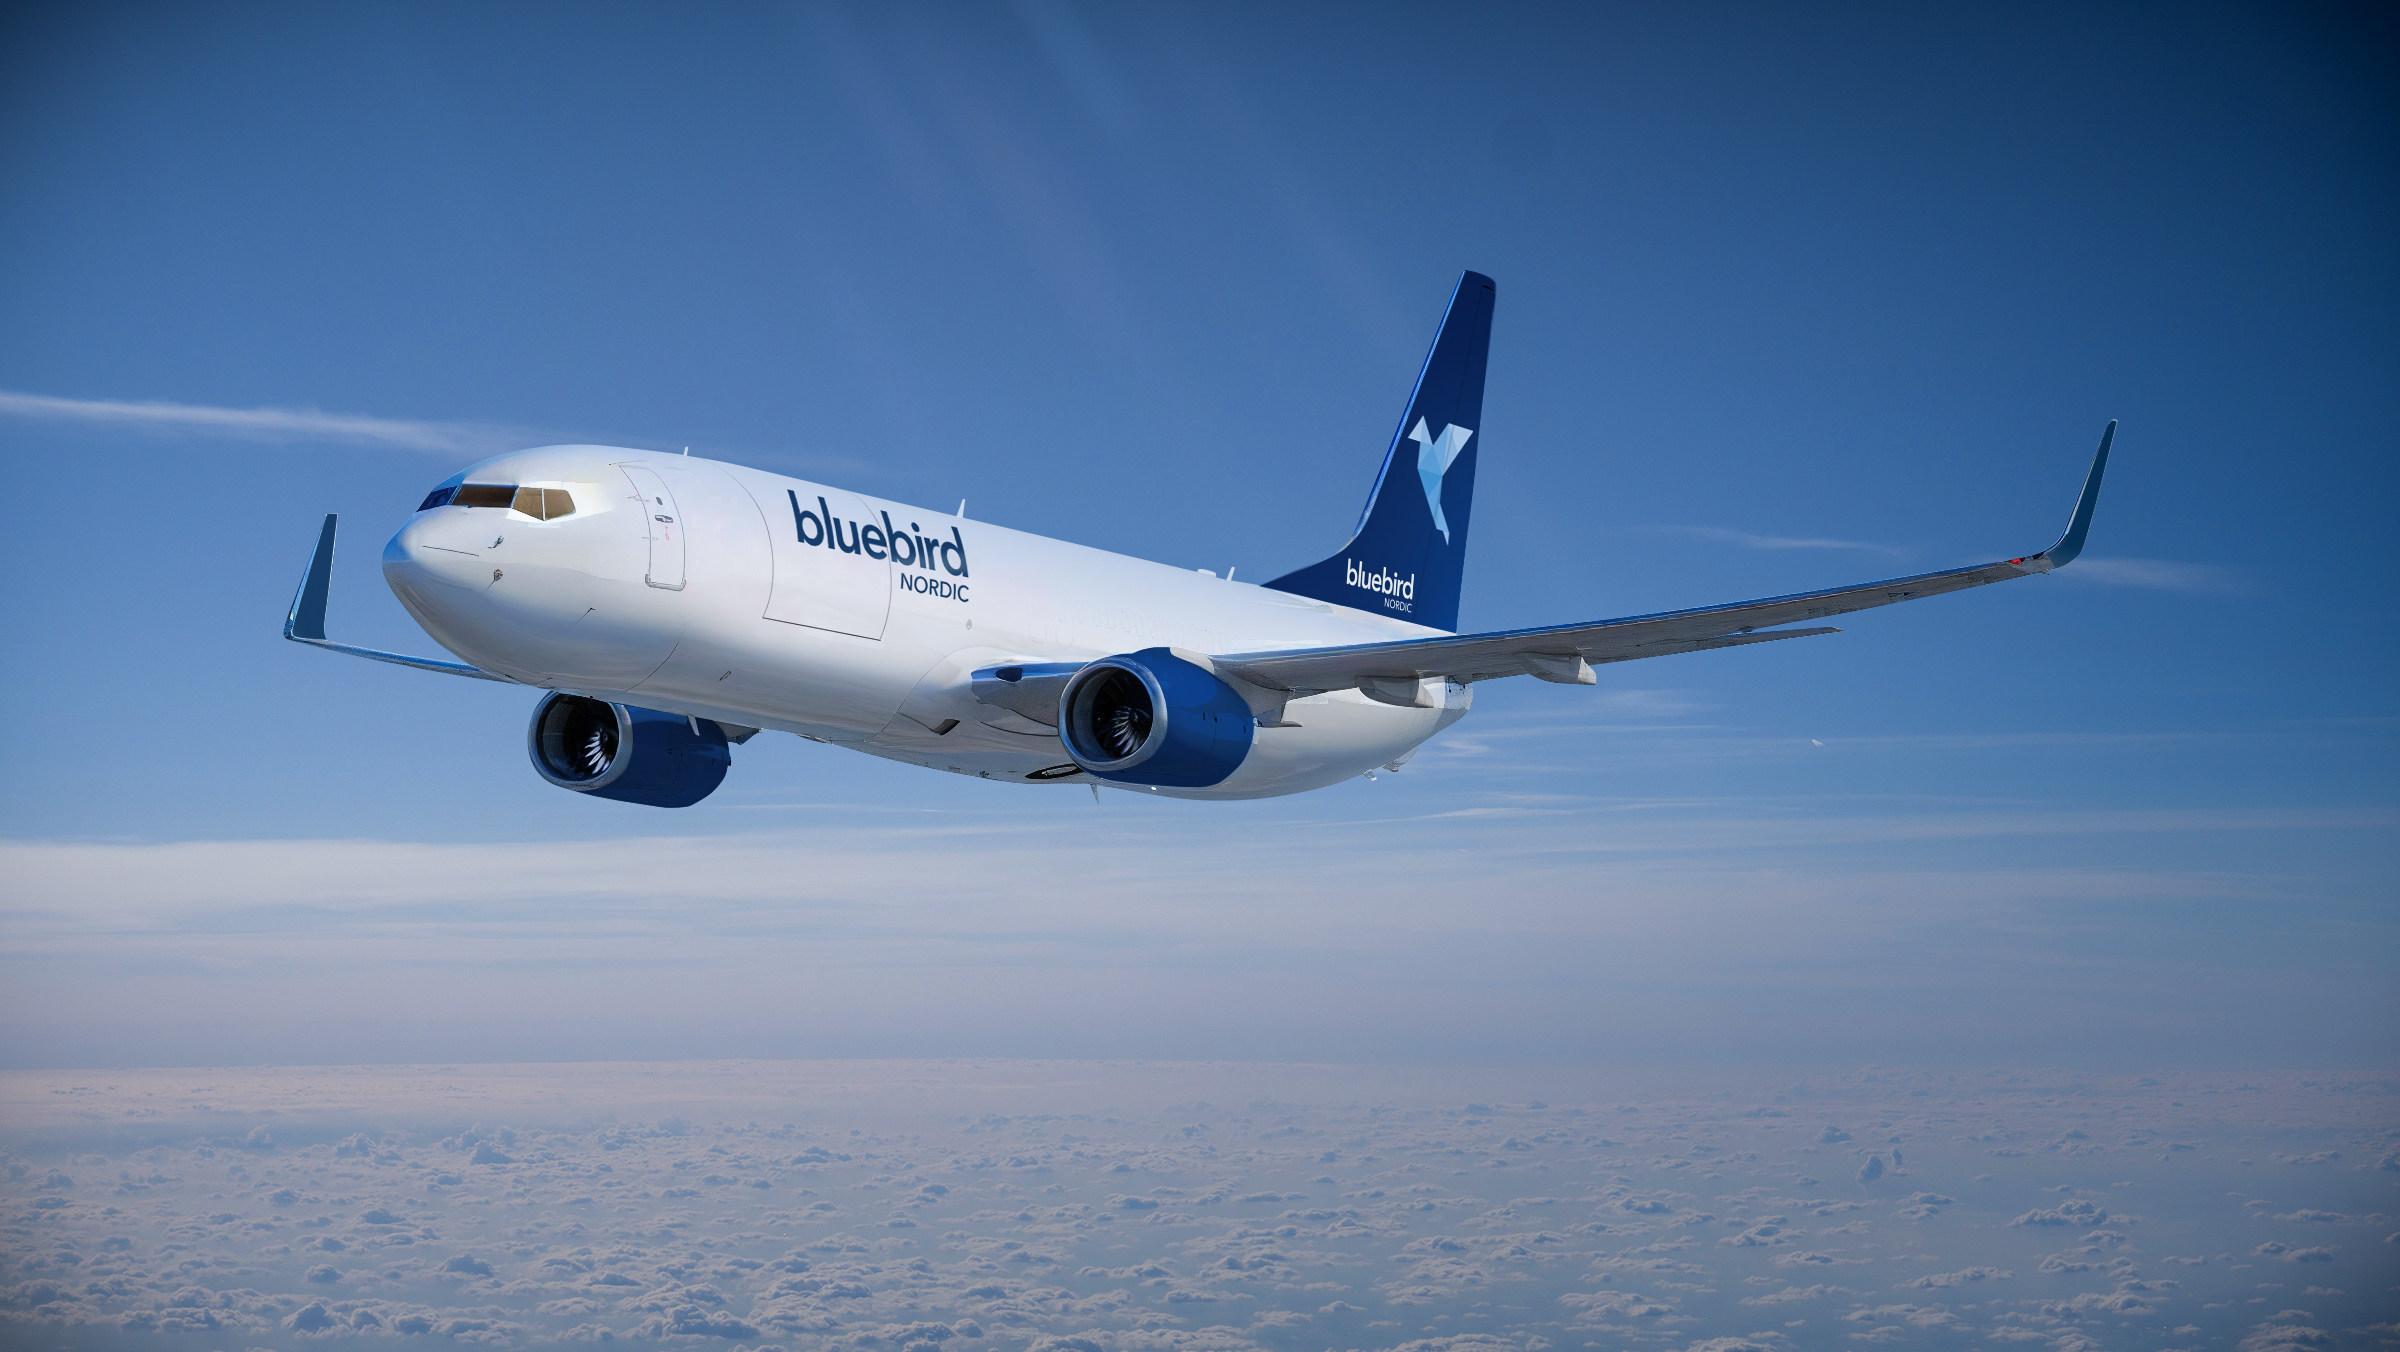 Boeing 737-800 fra Bluebird Nordic. (Foto: Bluebird Nordic | PR)